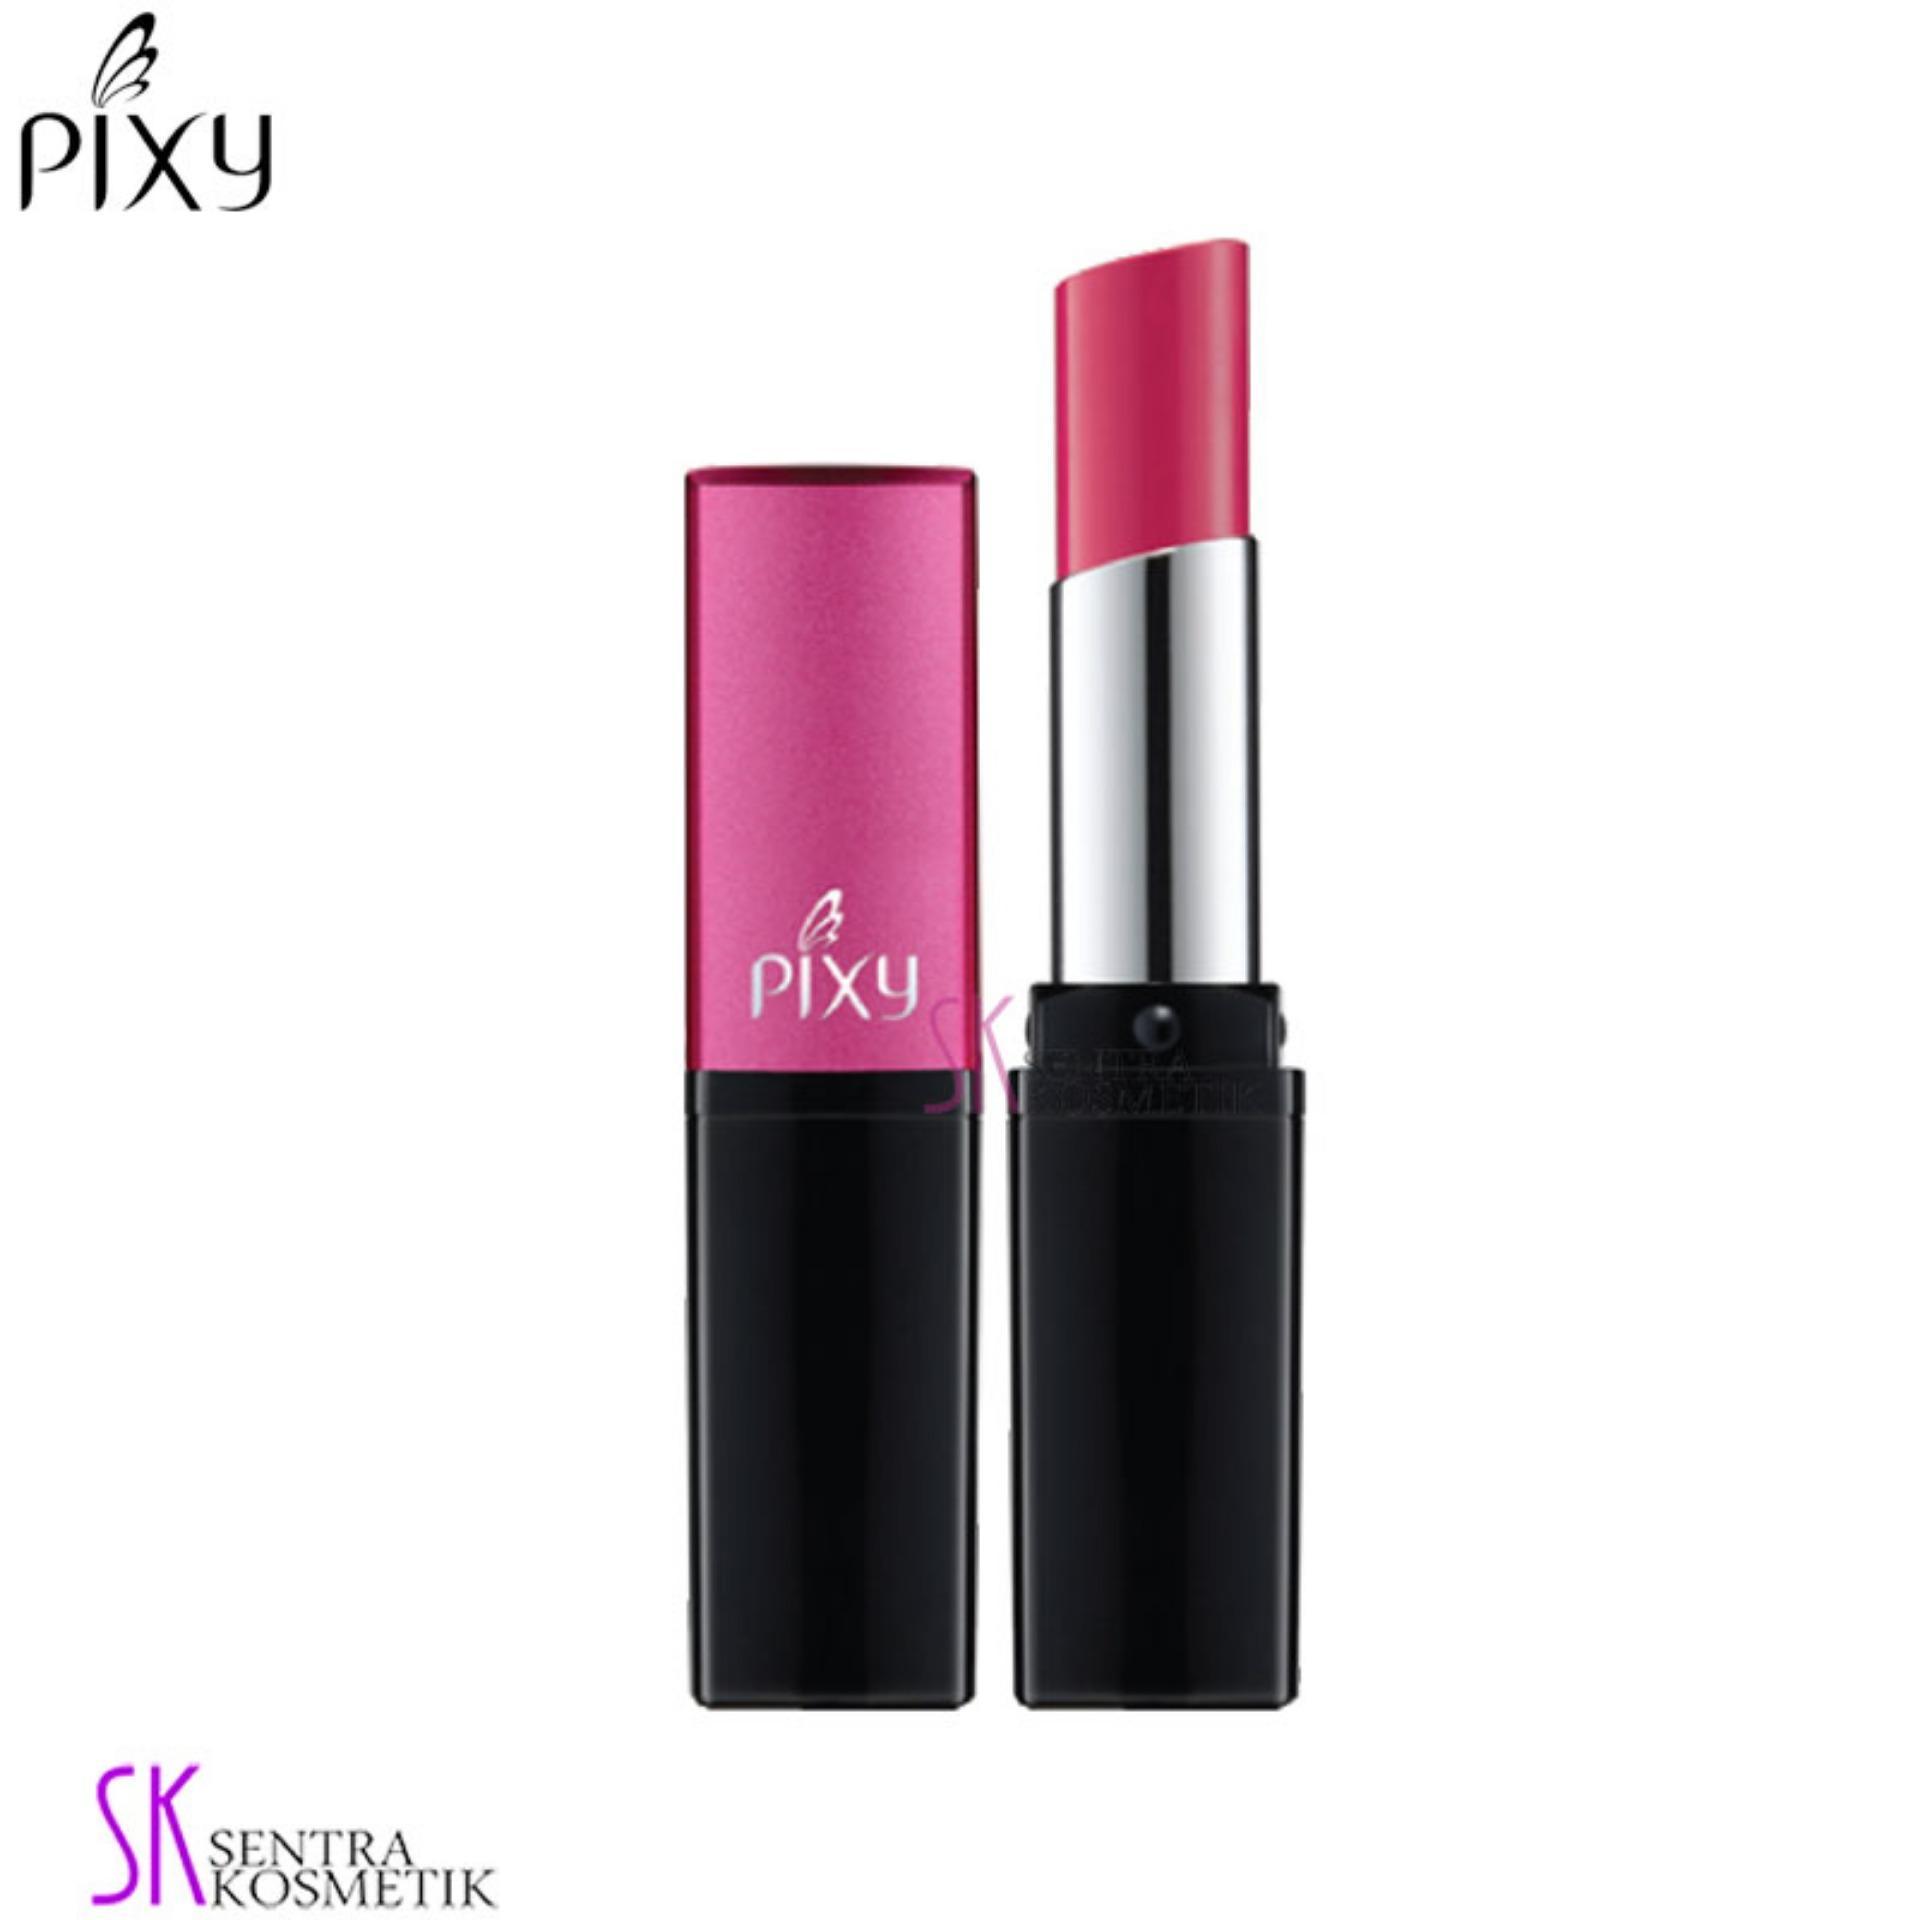 PIXY Matte In Love Lipstick - 211 VIBE PINK